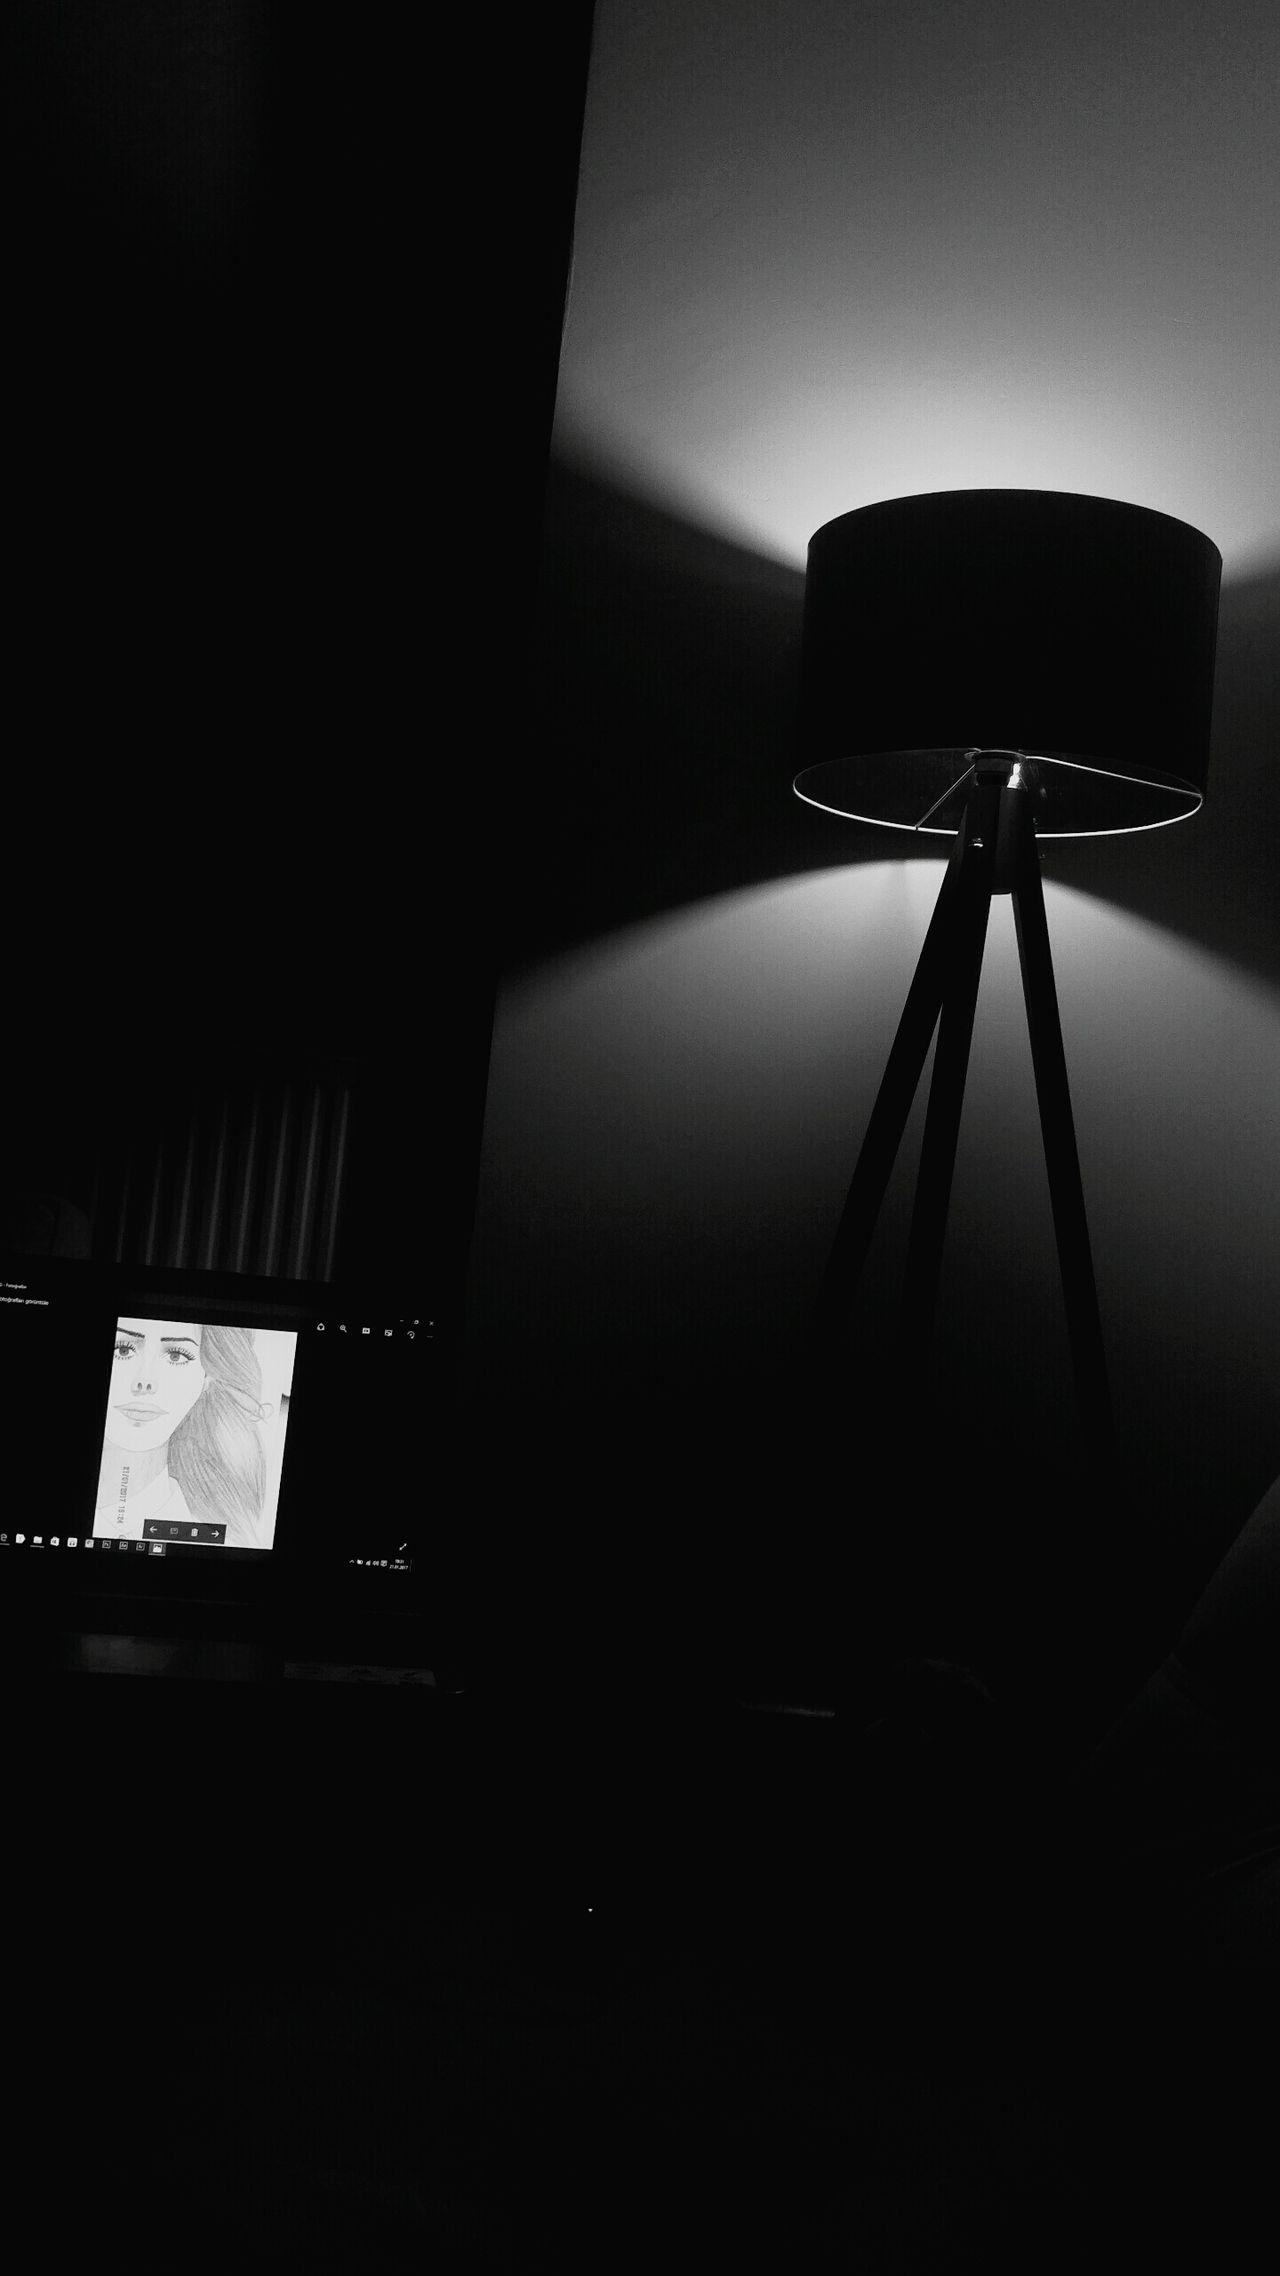 Mersinmarina Streeart Colour Of Life Populer Photos Karakalem Enjoying Life Graphic Design Kuşadası❤️ Cardriving Canakkake Desinger Desing Aydin Aydin/Turkey ArtWork Doğa Dogal Car Pozcu Drawing Adnanmenderesüniversitesi Taking Photos Hanging Out That's Me Aydın/Turkey